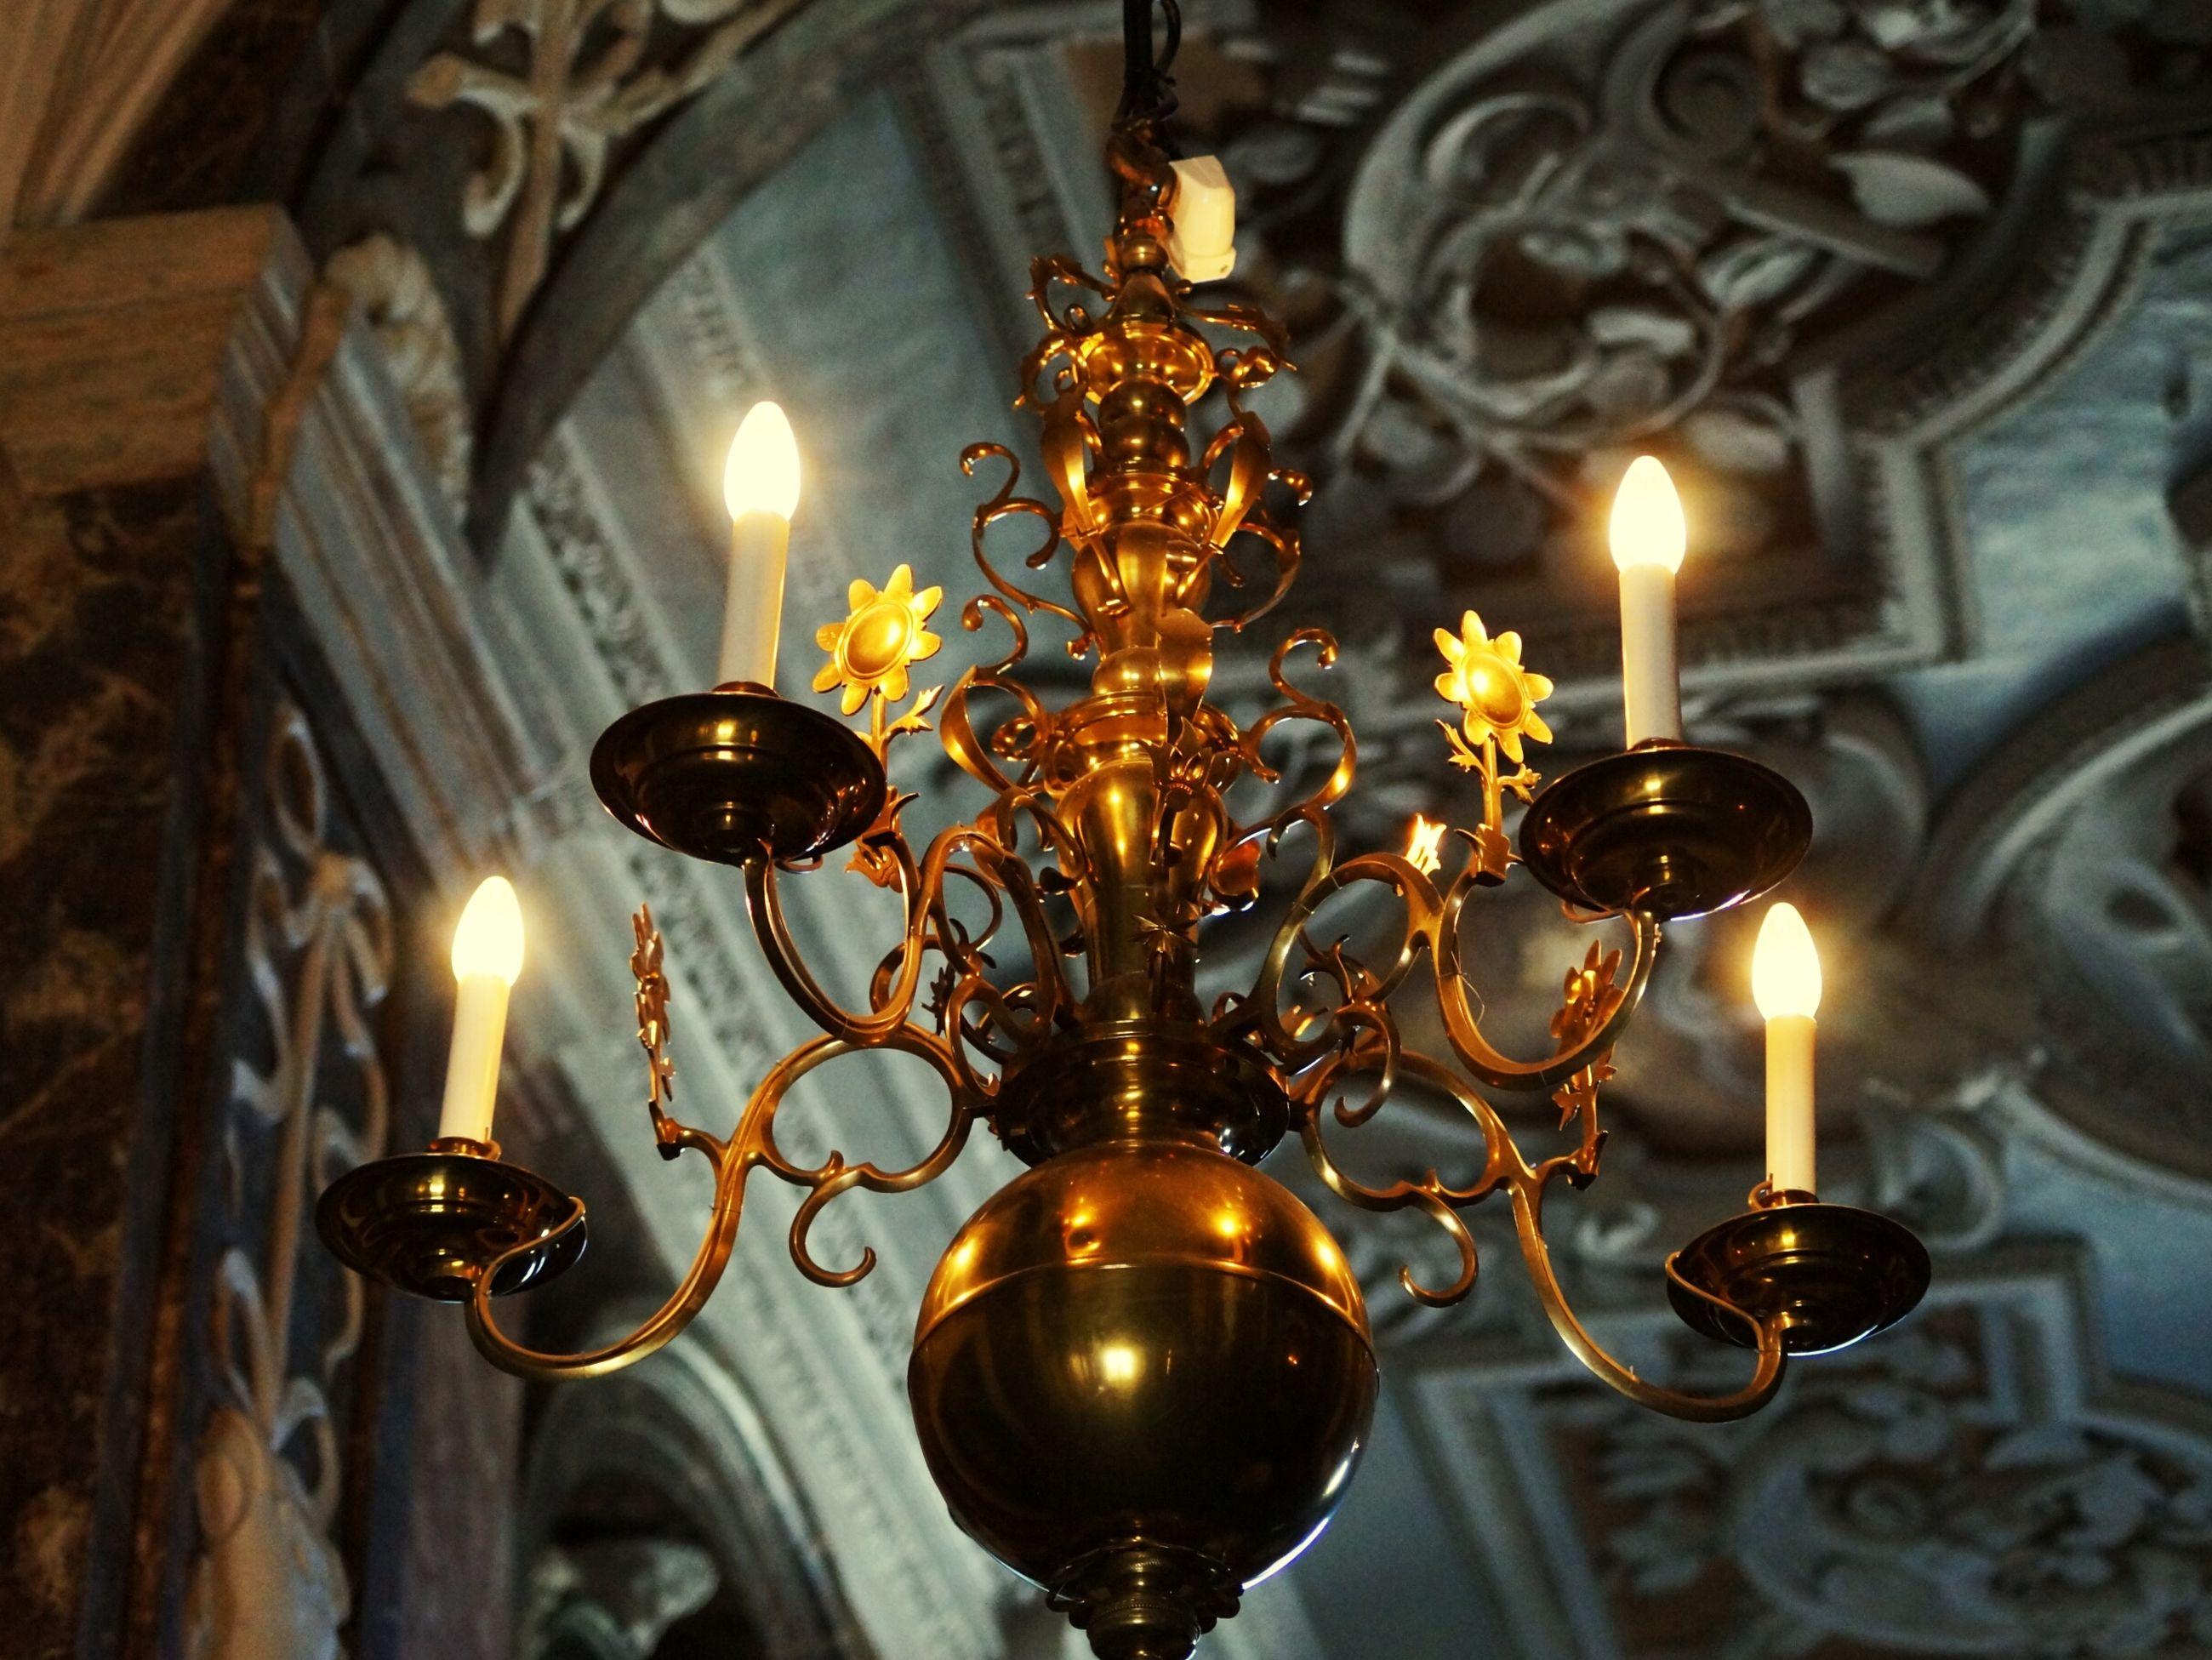 Close-up of illuminated chandelier